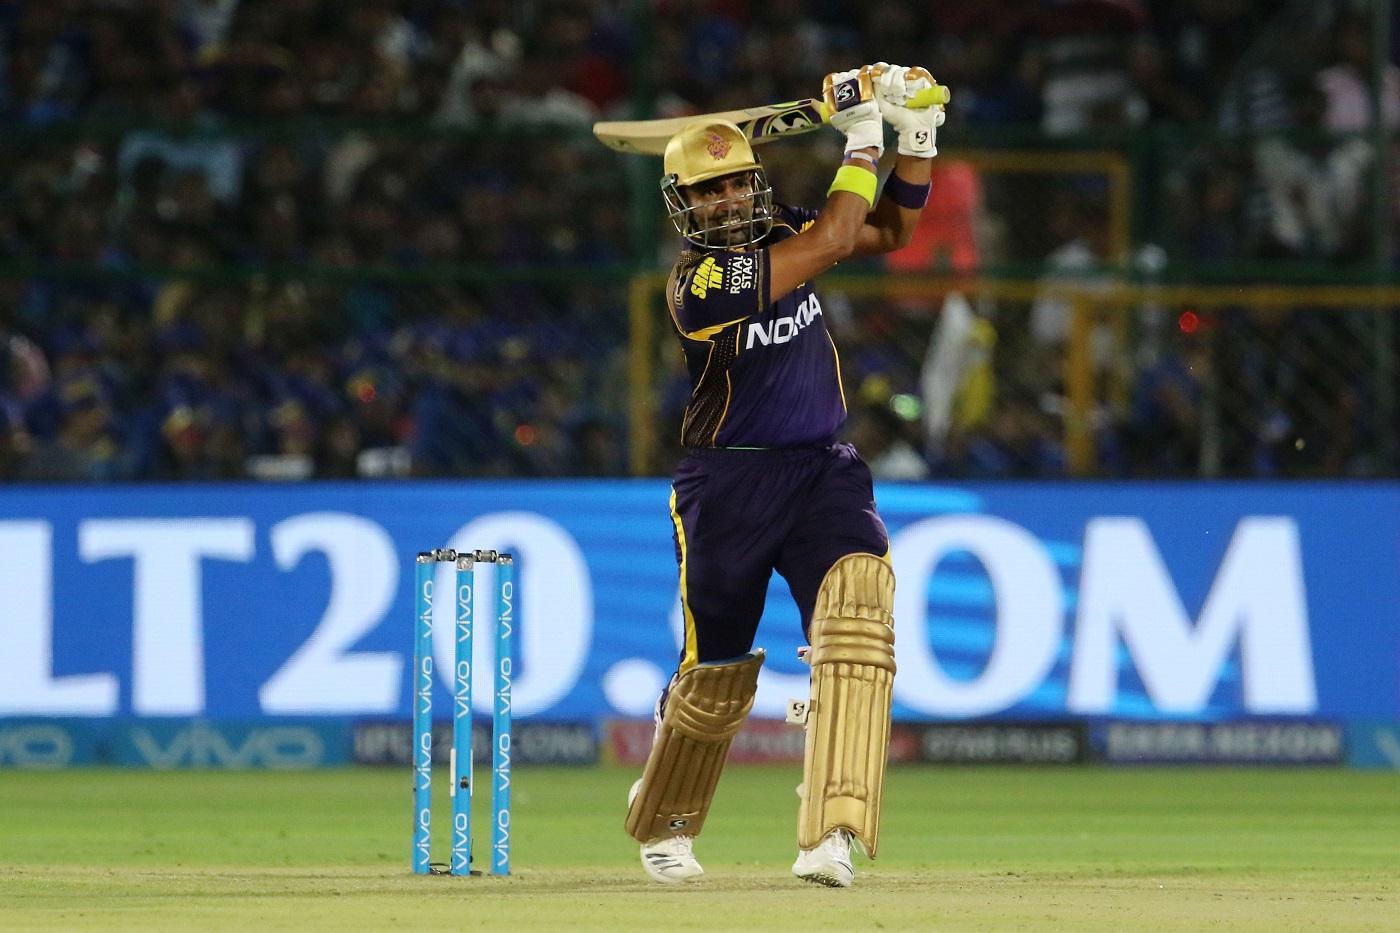 IPL 2018: Robin Uthappa Opens Up on Differences in Captaincy of Gautam Gambhir & Dinesh Karthik 2